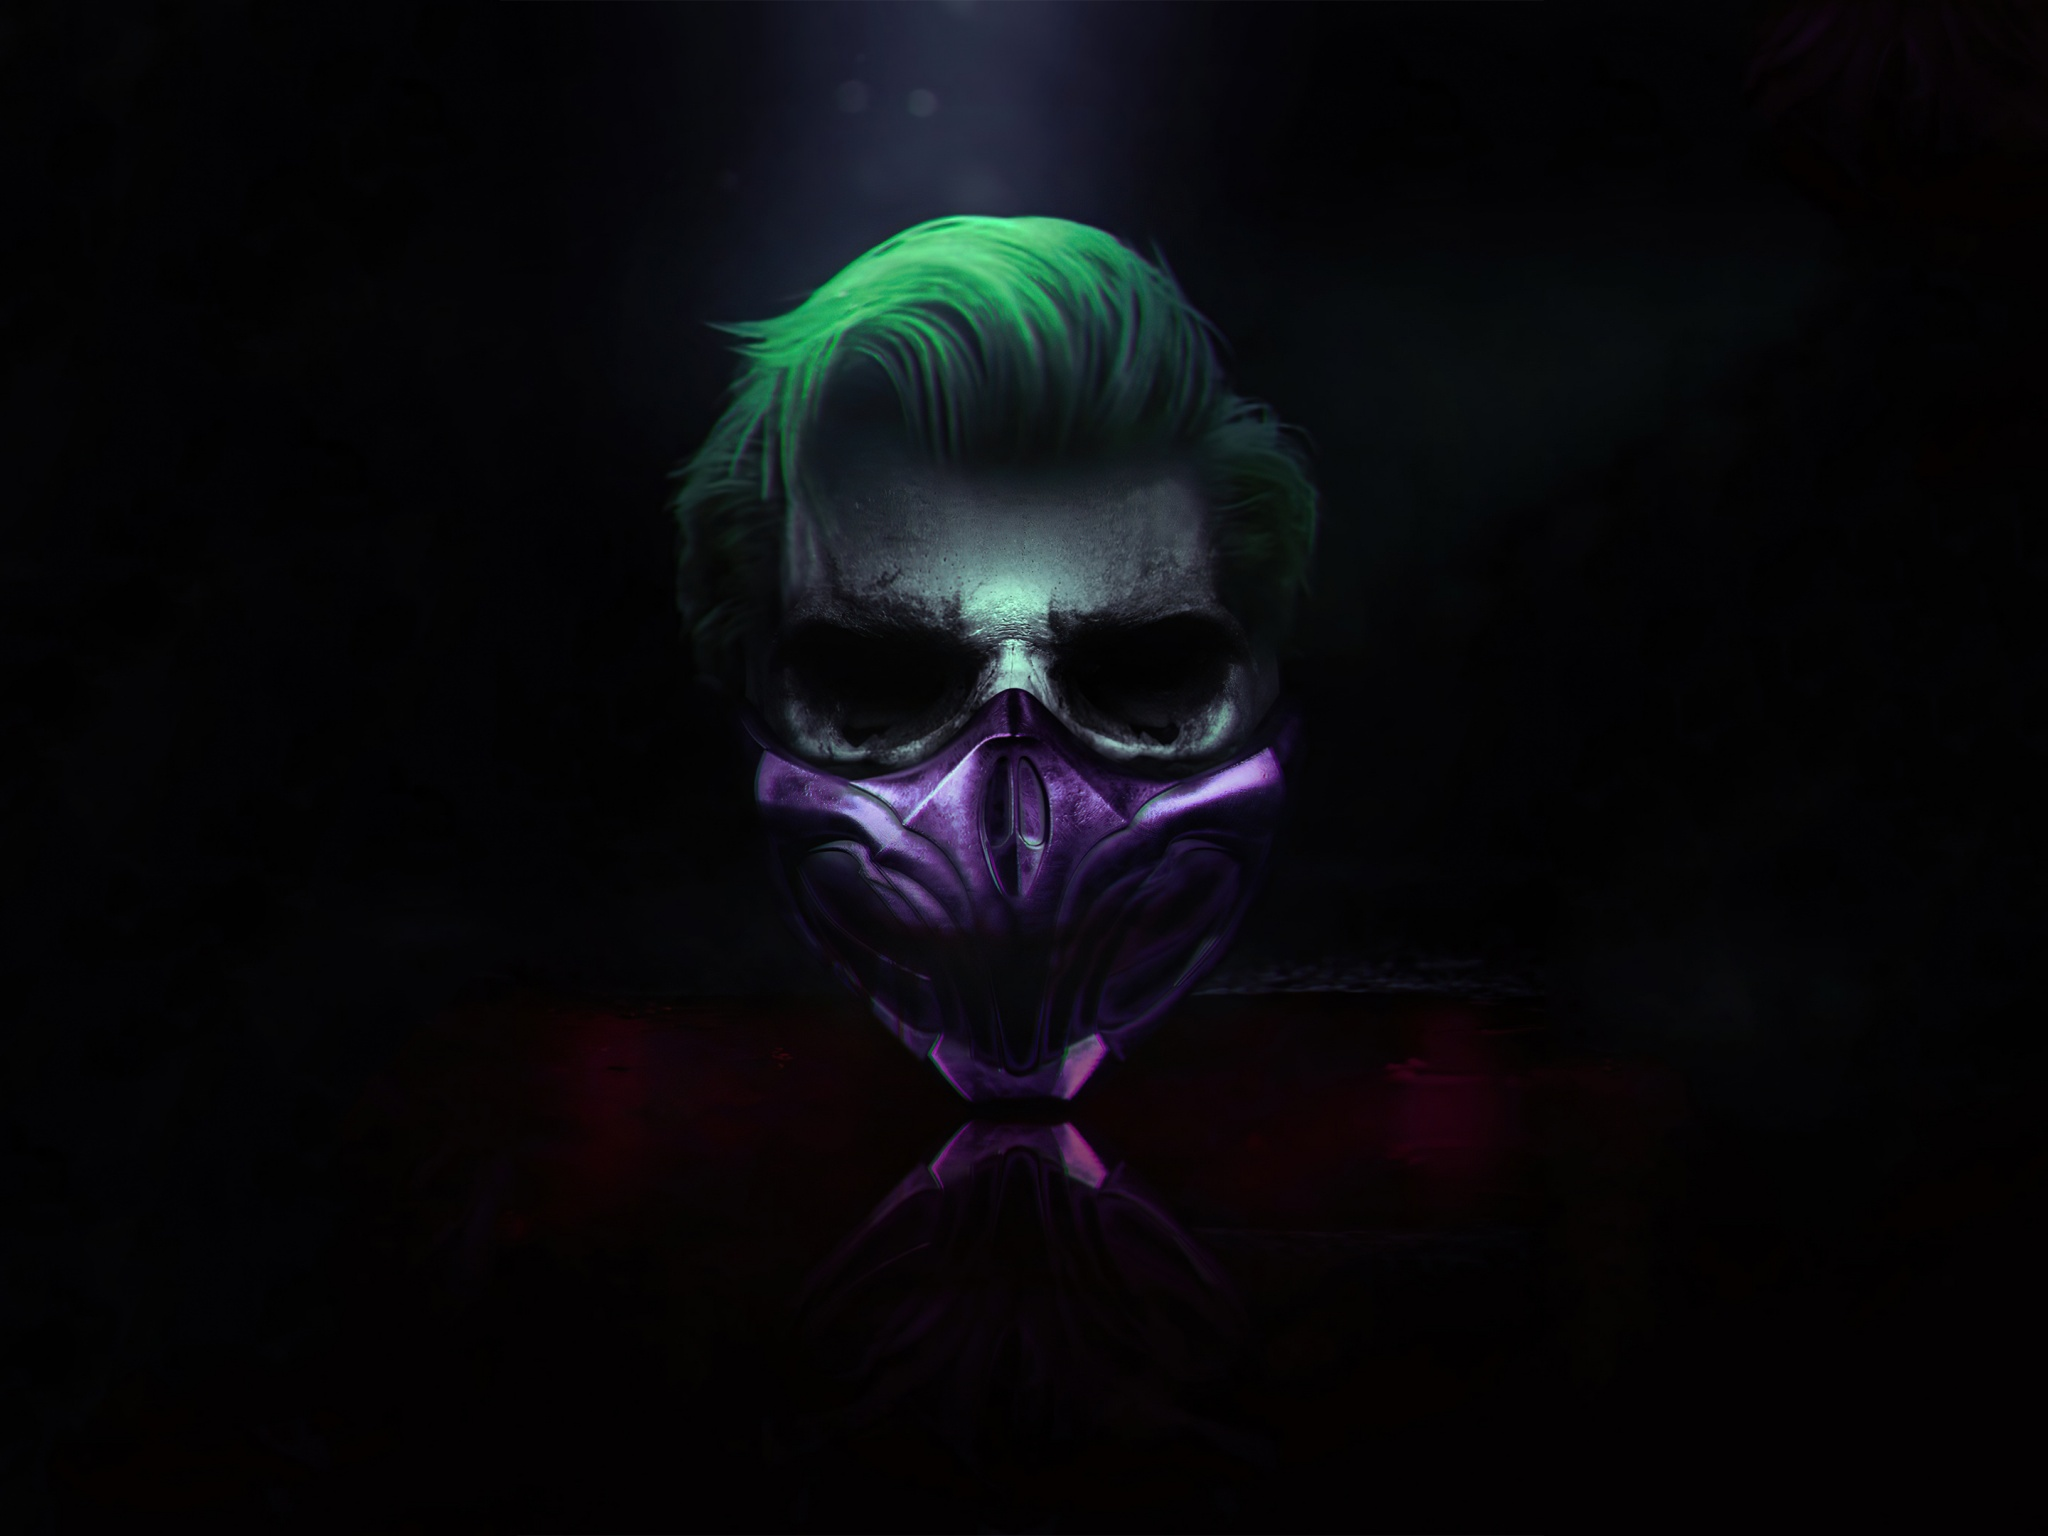 Joker 4k Wallpaper Mask Cyberpunk Dark Background Graphics Cgi 1483